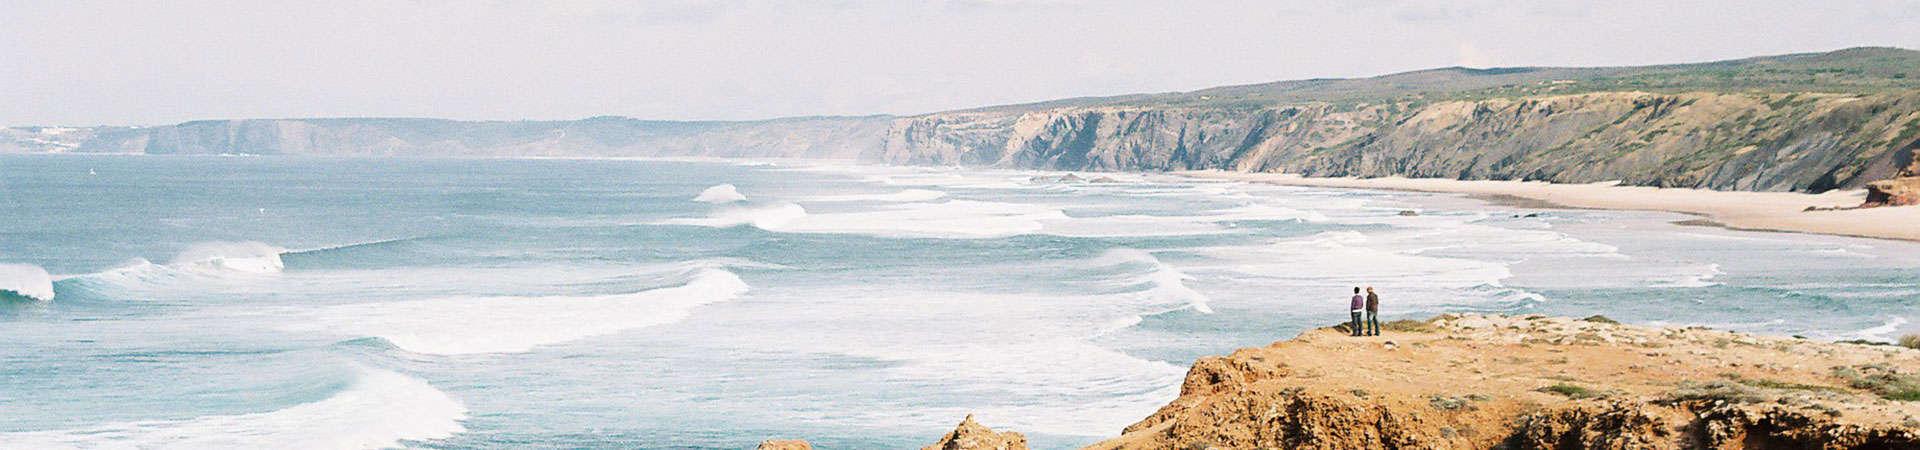 surf guiding surf spot check algarve